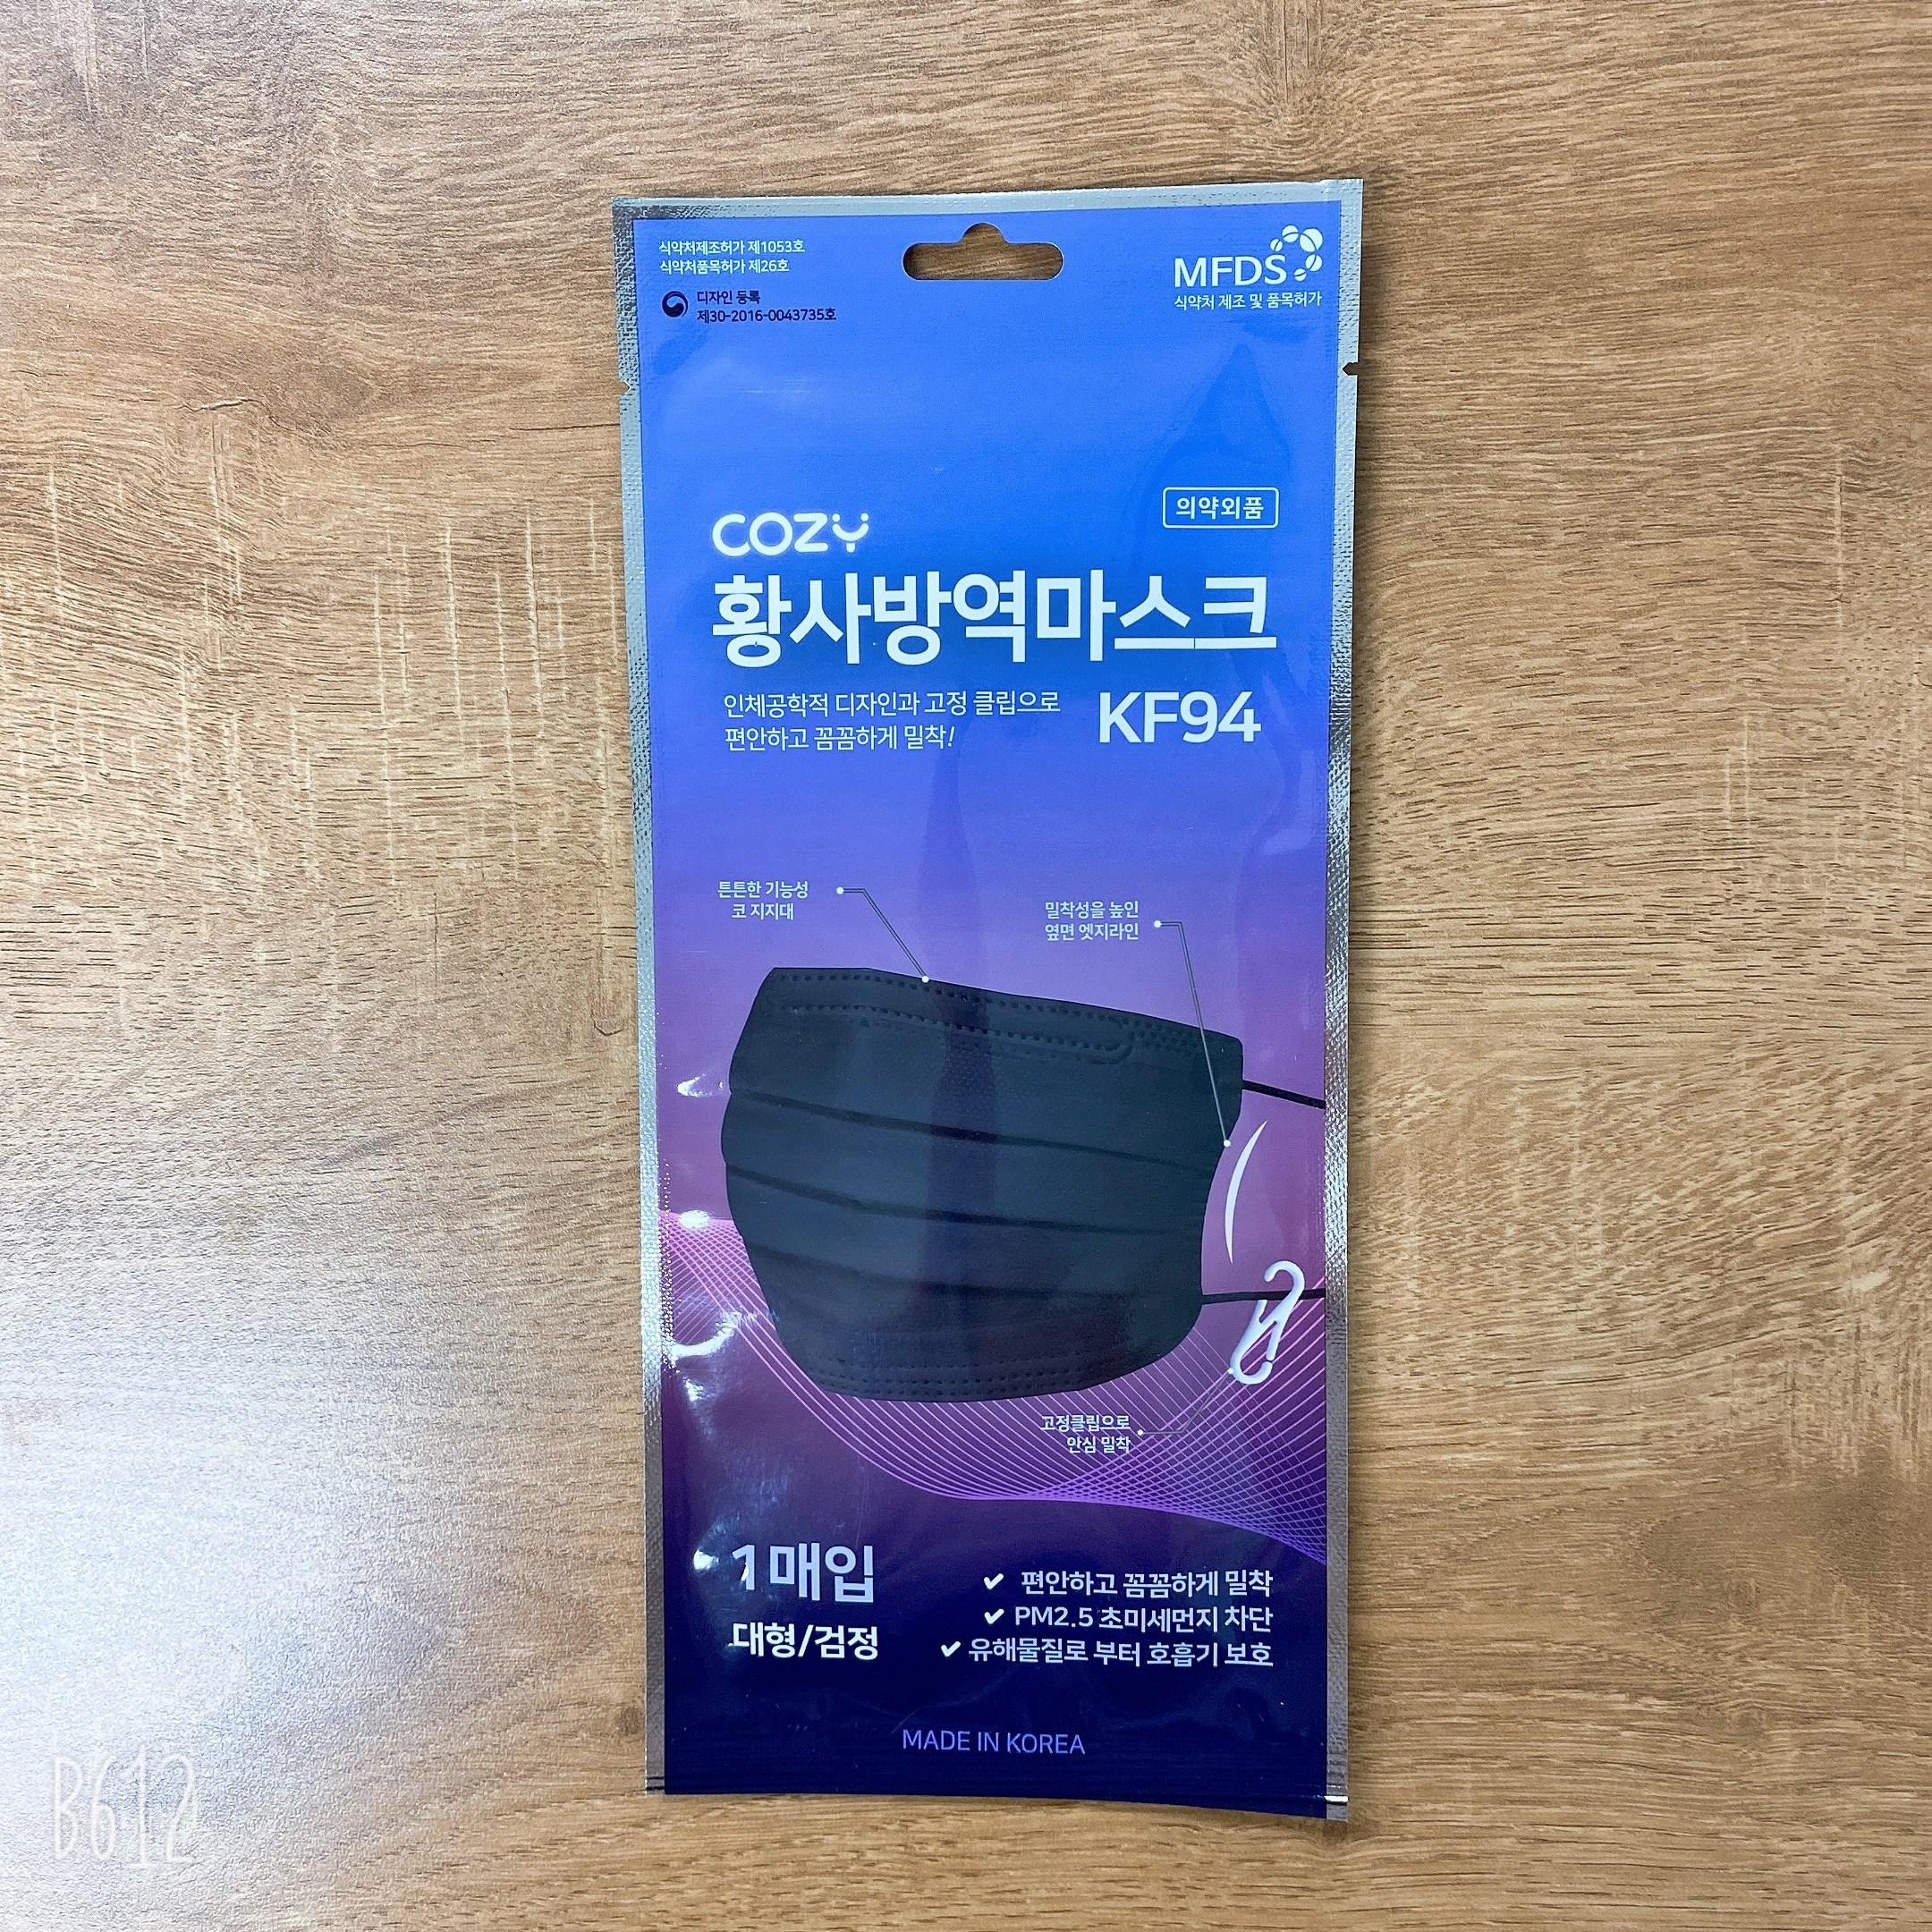 cozy KF94 황사방역마스크 대형 블랙 1매입 10개, 1개, 10매입